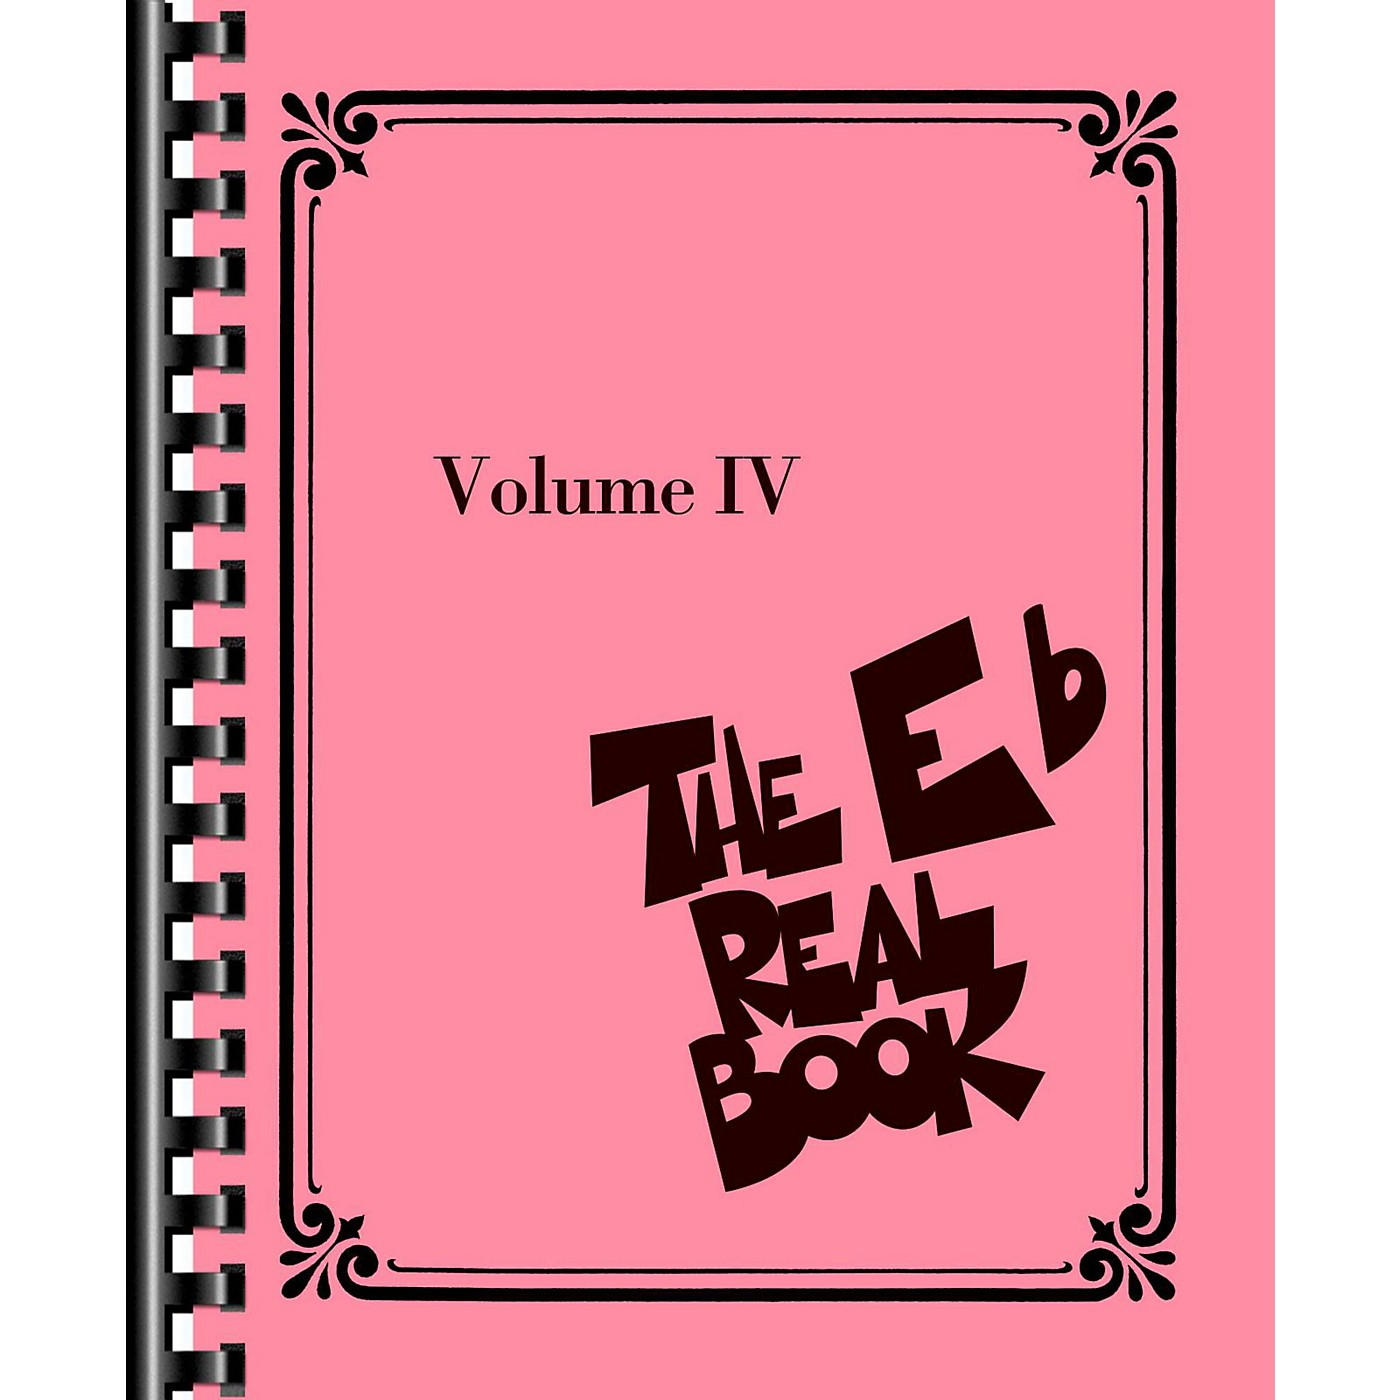 Hal Leonard The Real Book - Volume IV (E-Flat Edition) thumbnail